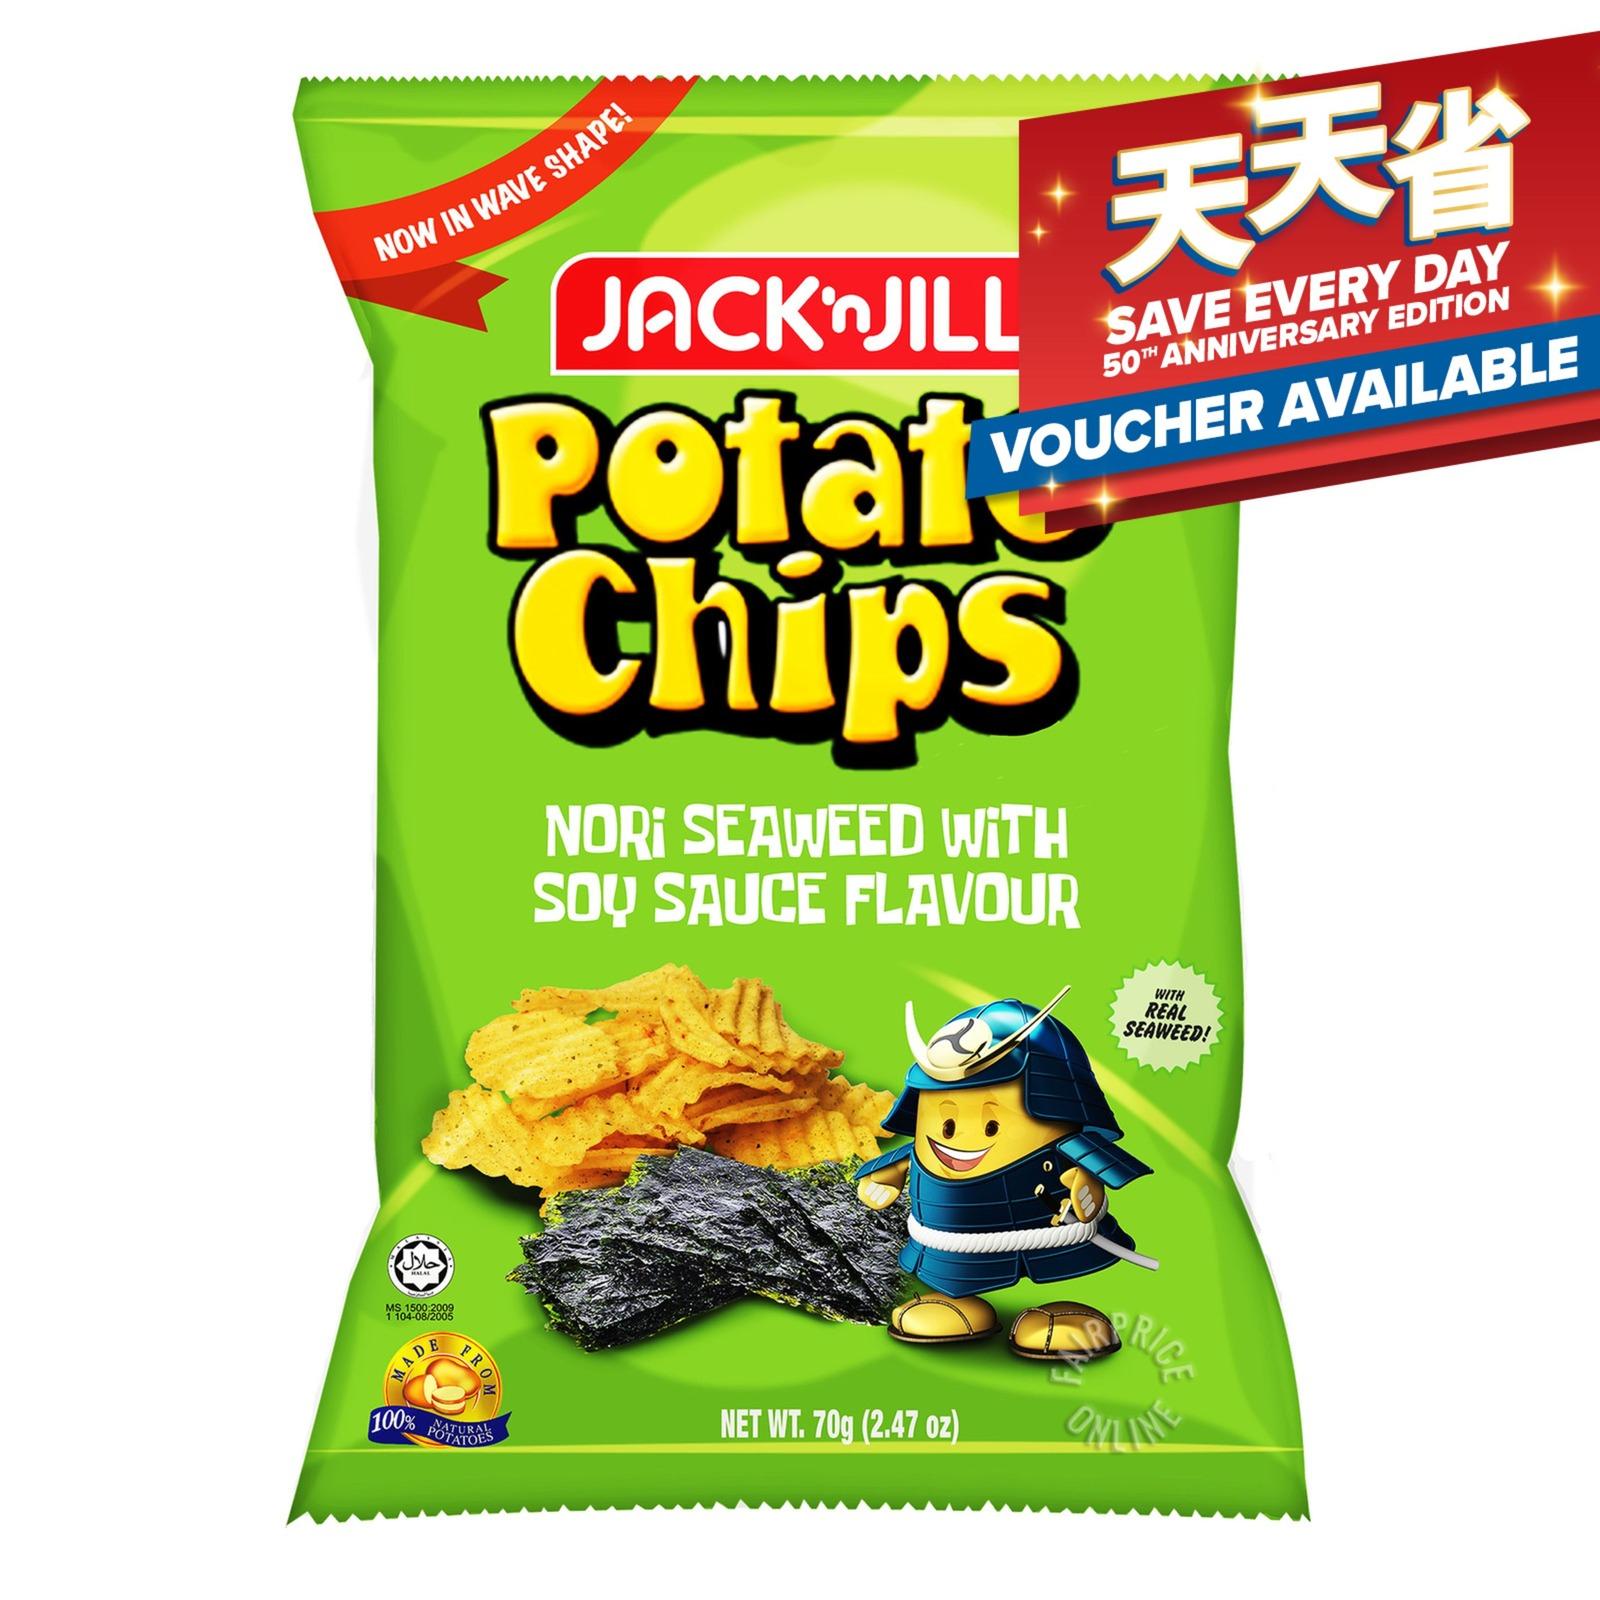 Jack'n Jill Potato Chips - Nori Seaweed with Soy Sauce